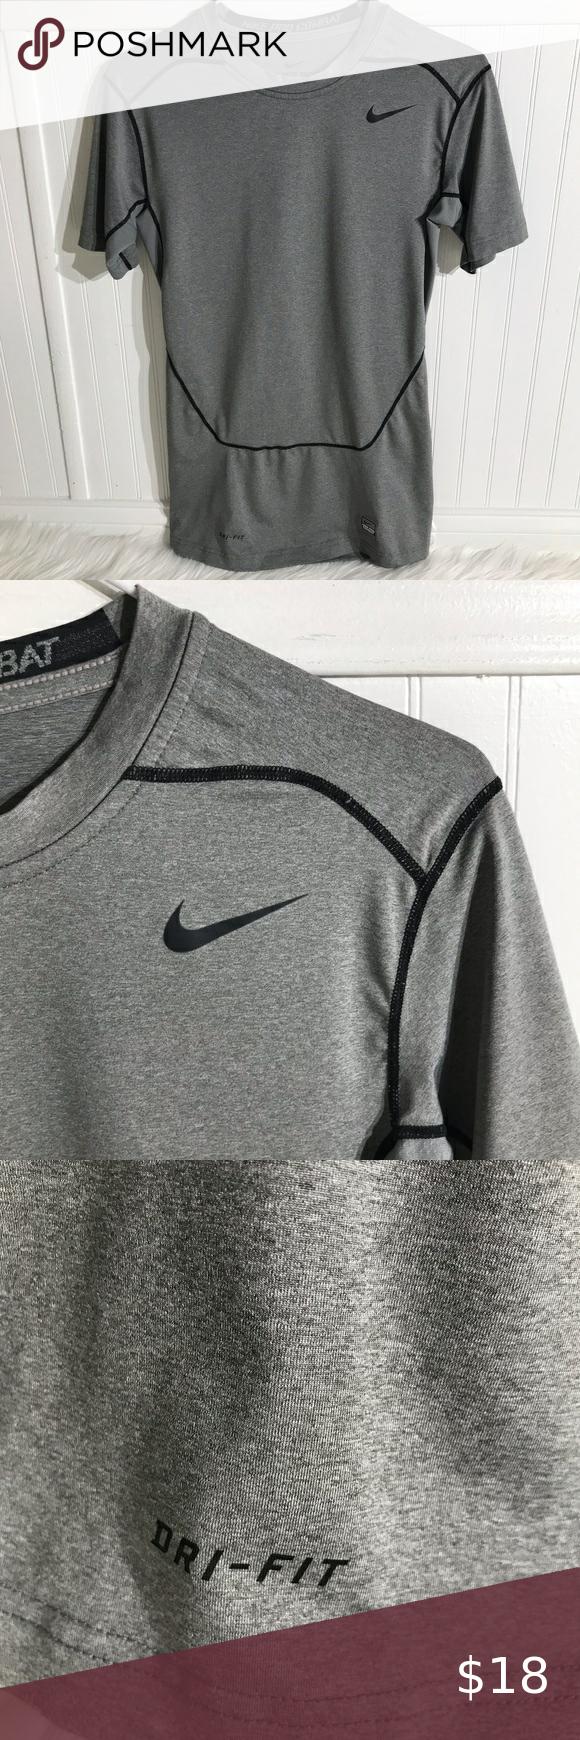 Nike Pro Combat Dri Fit Men S Fitted T Shirt Sz M Nike Pro Combat Dri Fit Nike Pros [ 1740 x 580 Pixel ]